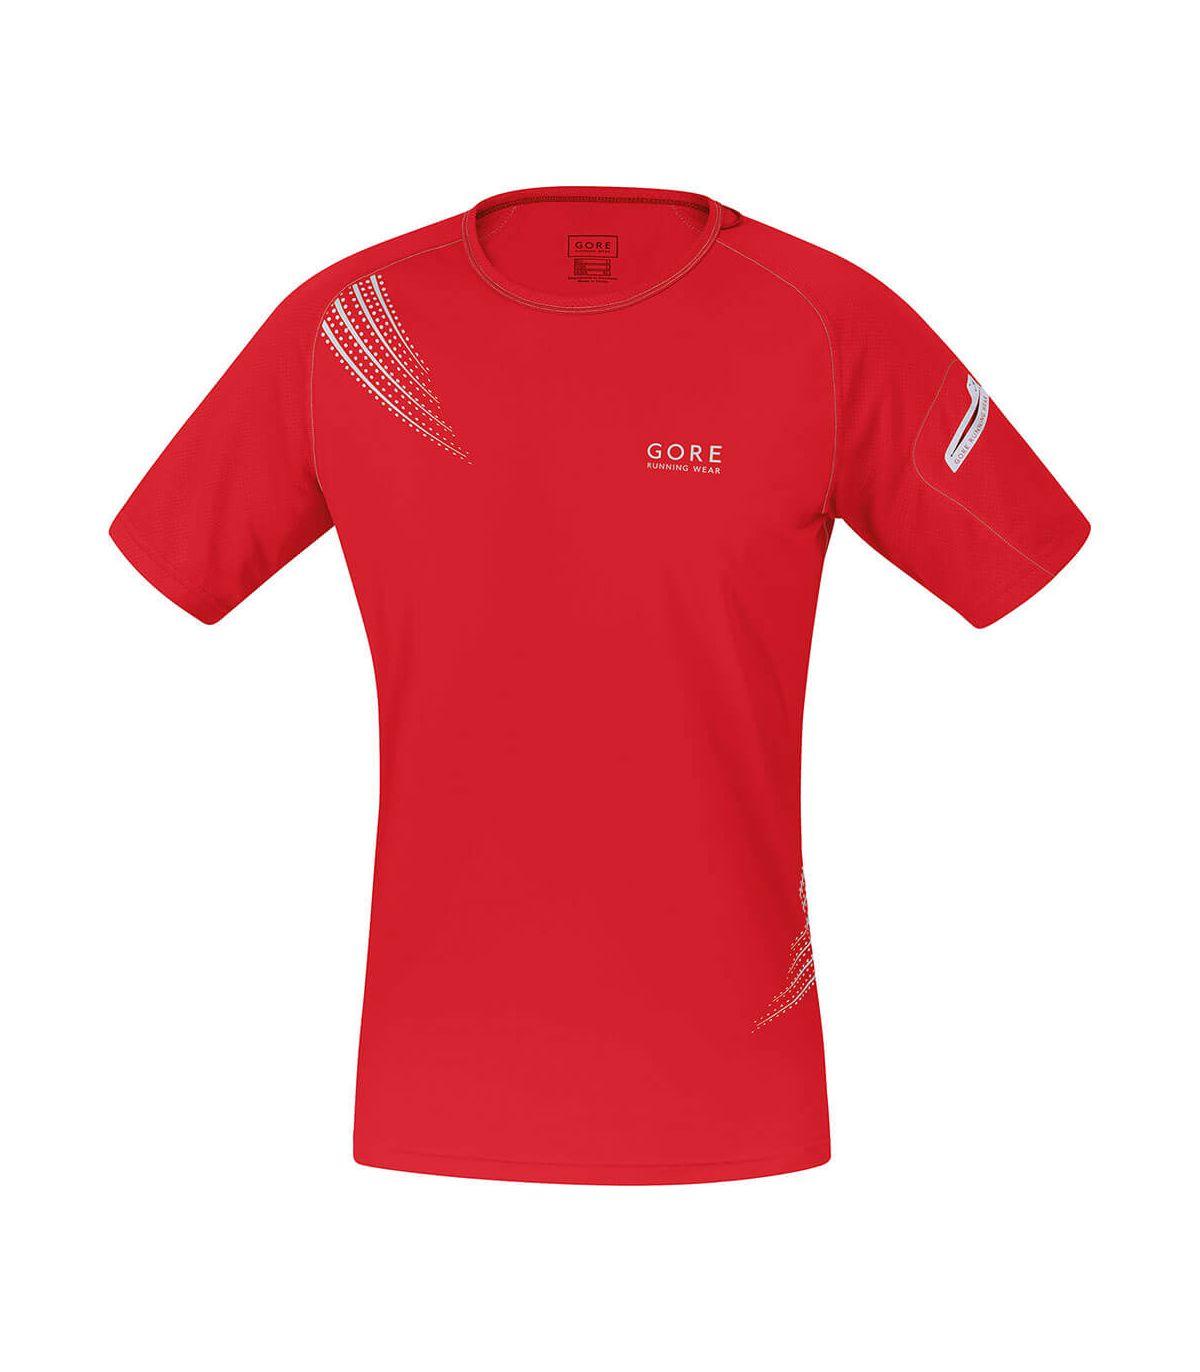 Gore T-Shirt Magnitude 2.0